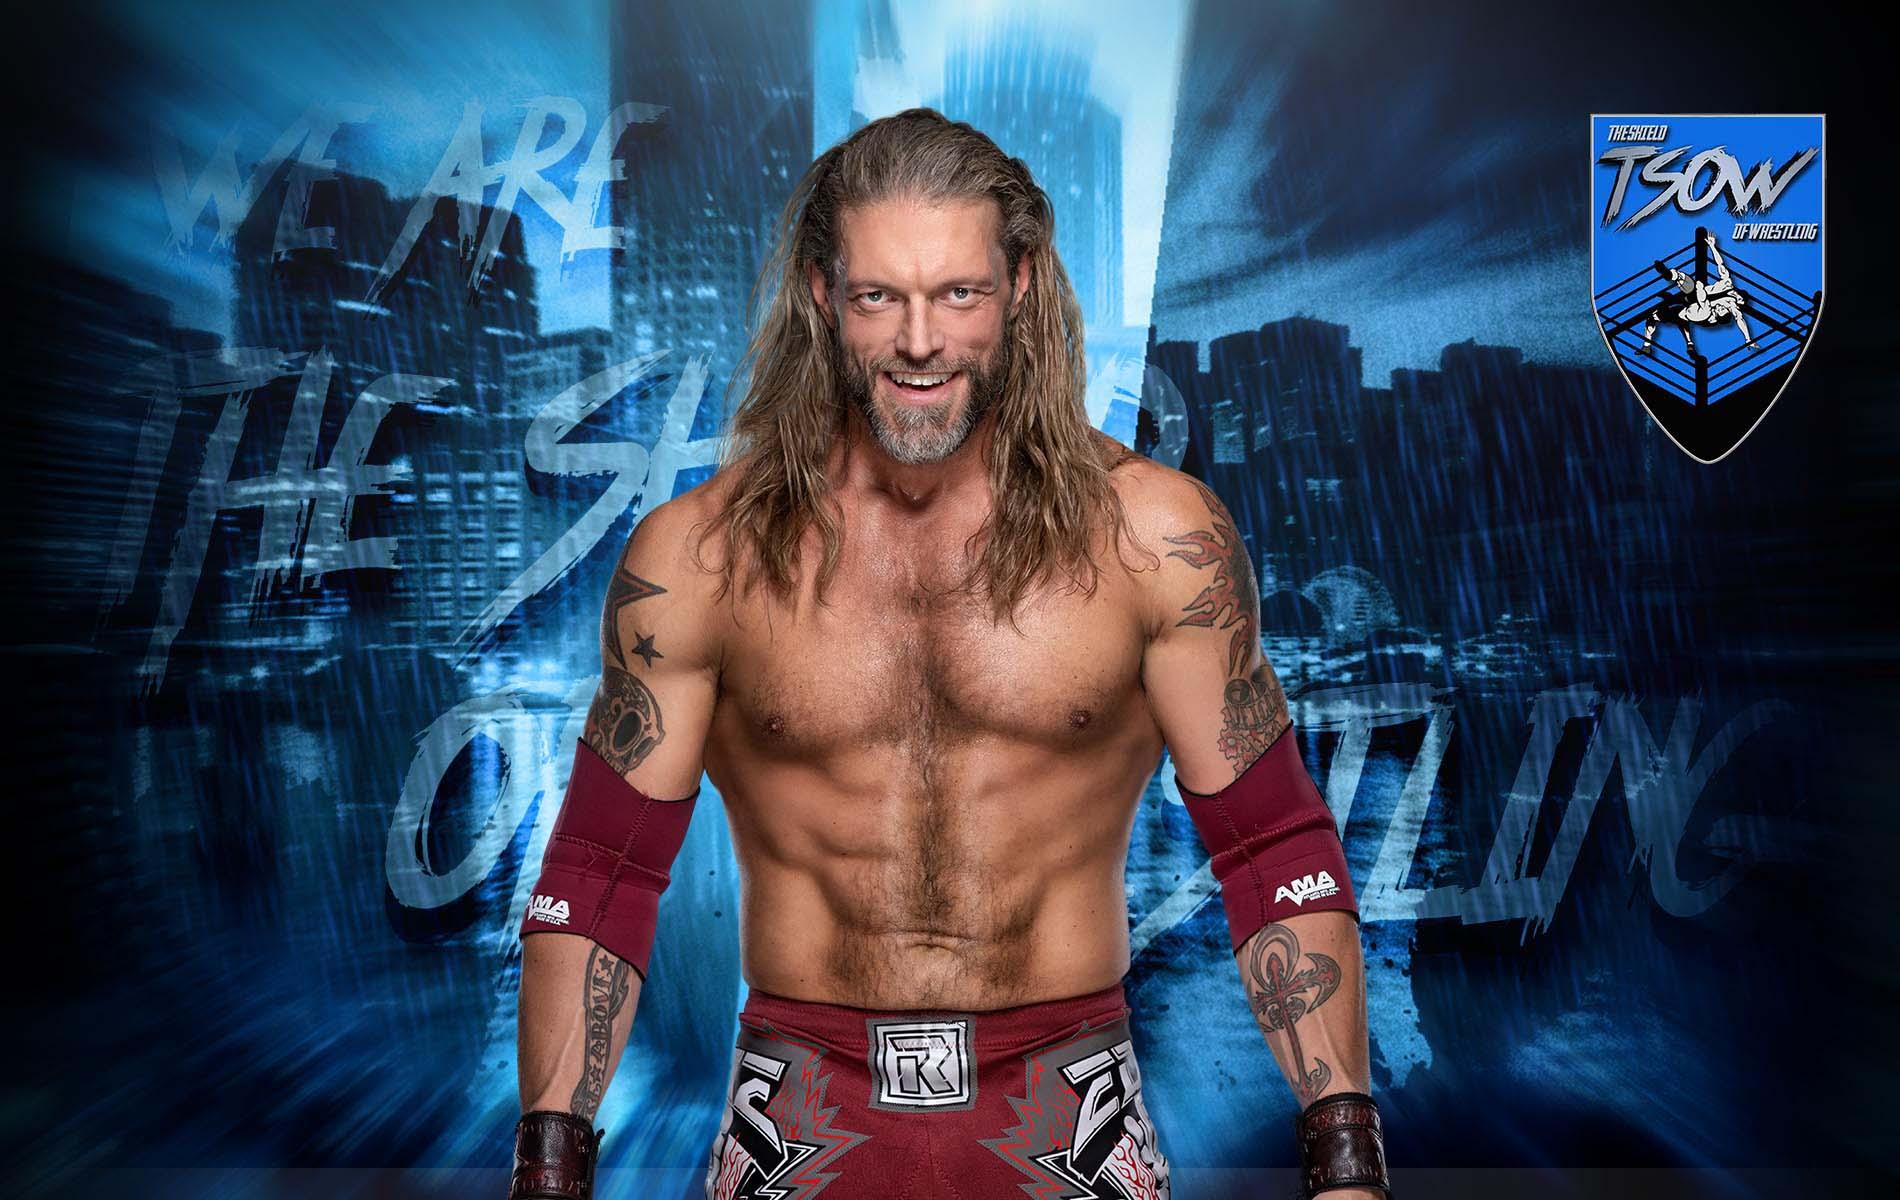 Edge lotterà a SummerSlam?